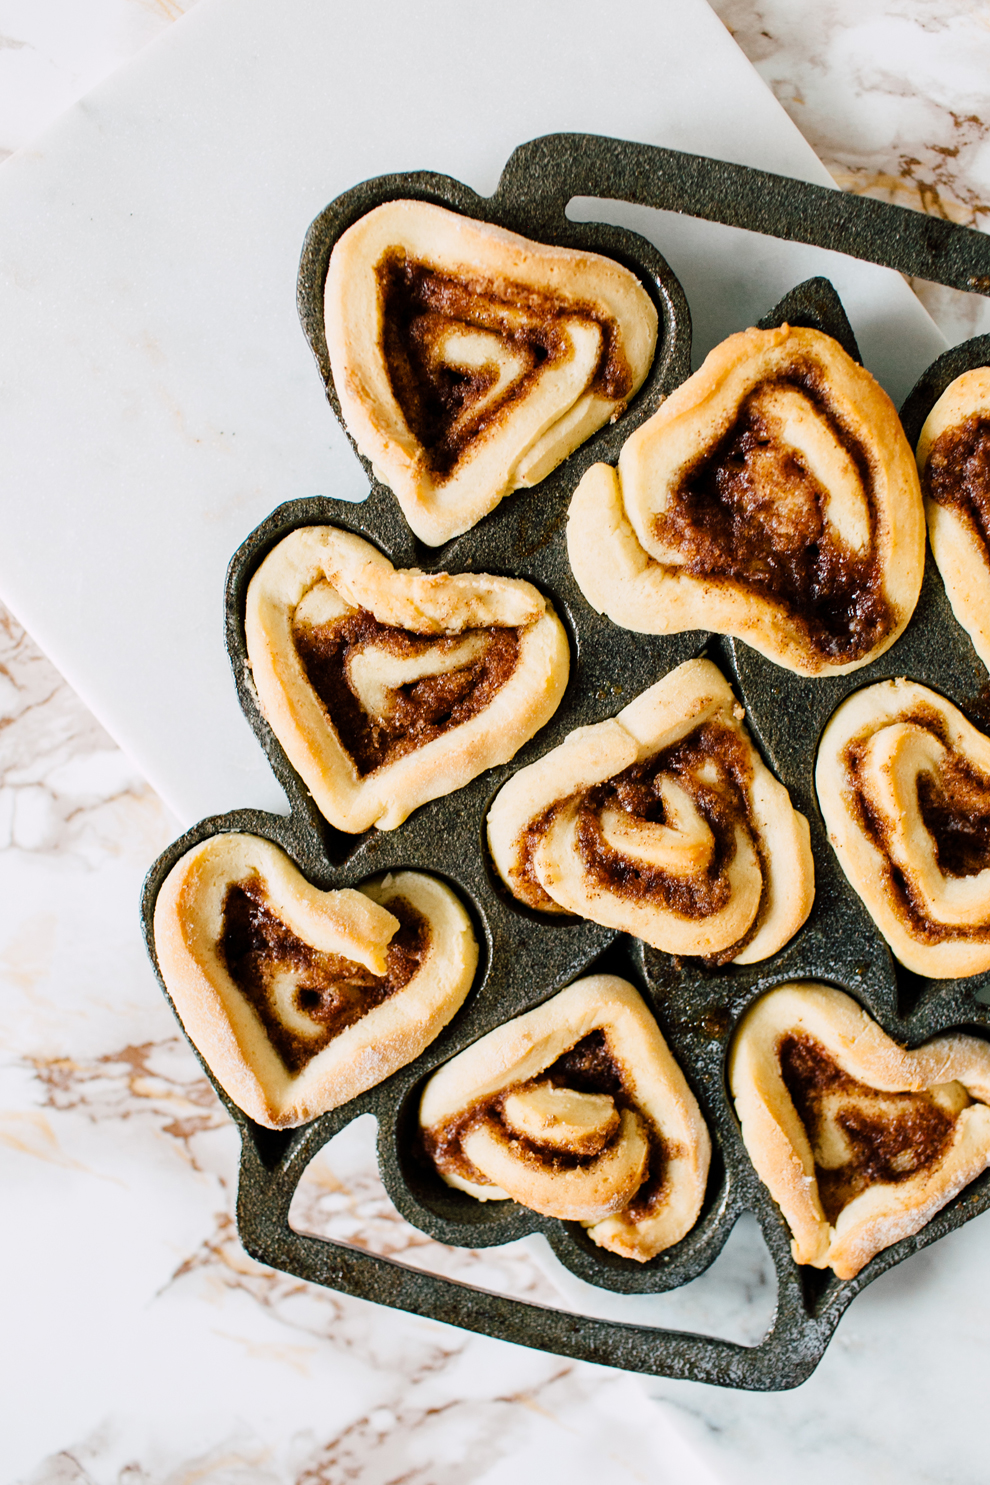 003-bellingham-food-photographer-cinnamon-rolls-baking-katheryn-moran-photography.jpg